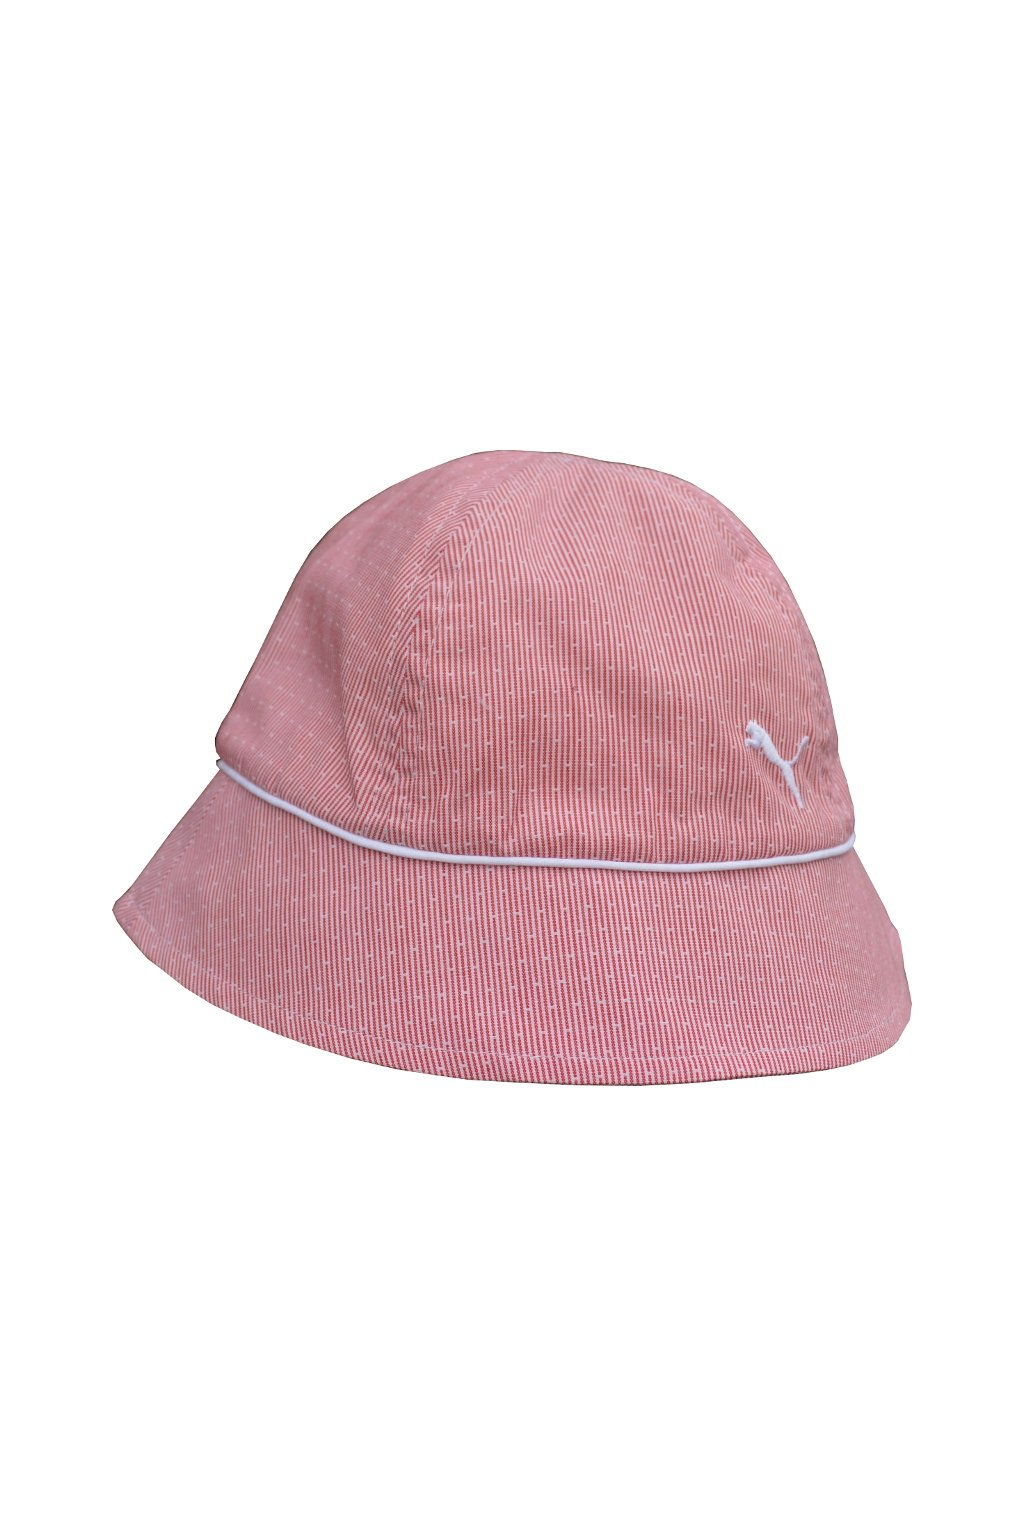 puma MINICATS UV SUNHAT 828288-01